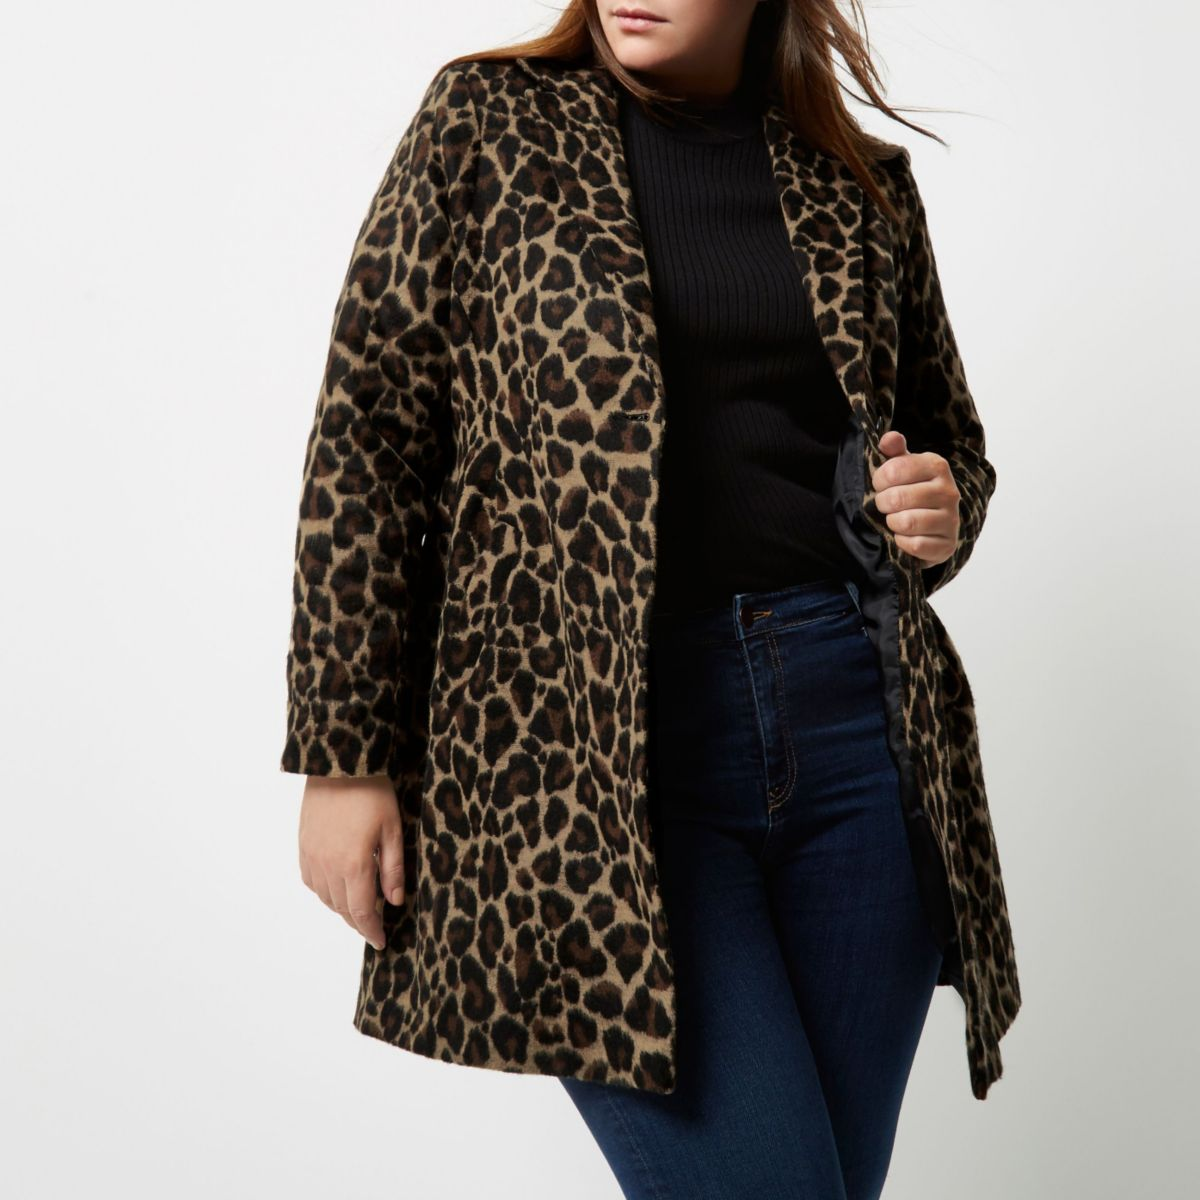 5 Ways To Wear Leopard Print forecasting